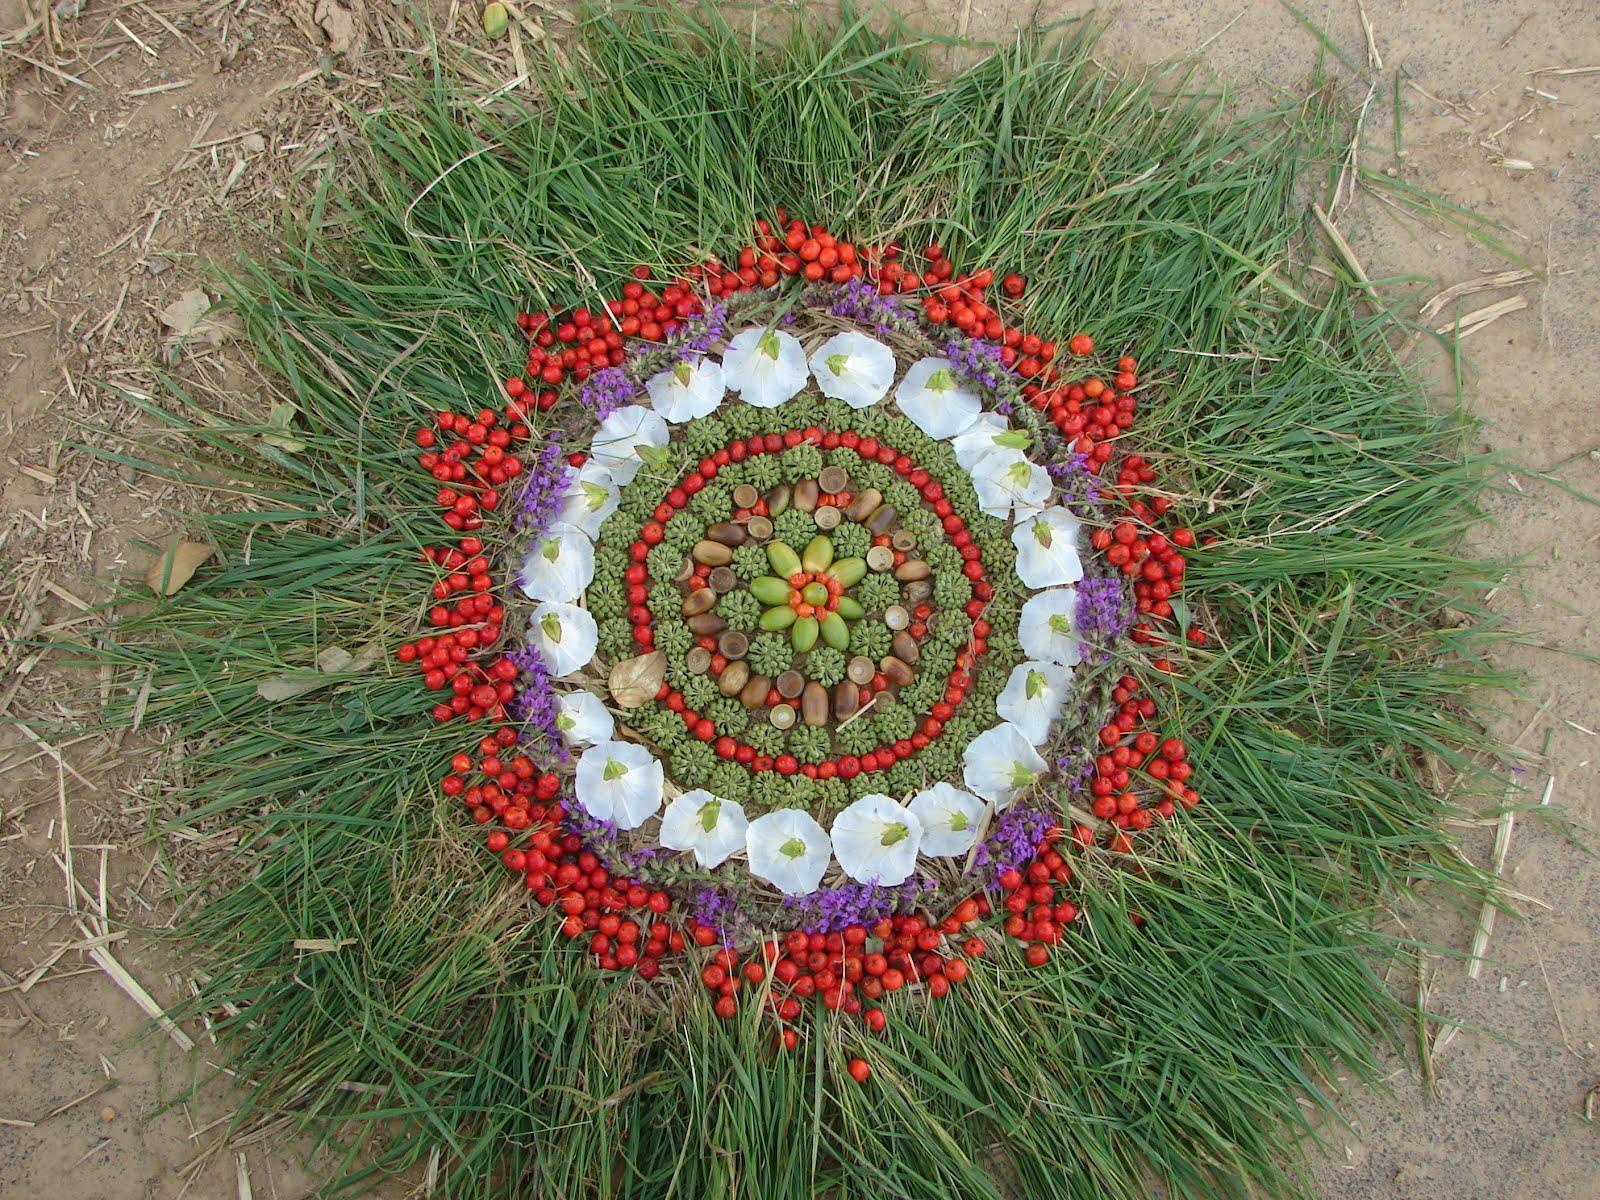 1000 images about mandalas naturales natural mandalas on pinterest flower mandala mandalas - Mandala nature ...